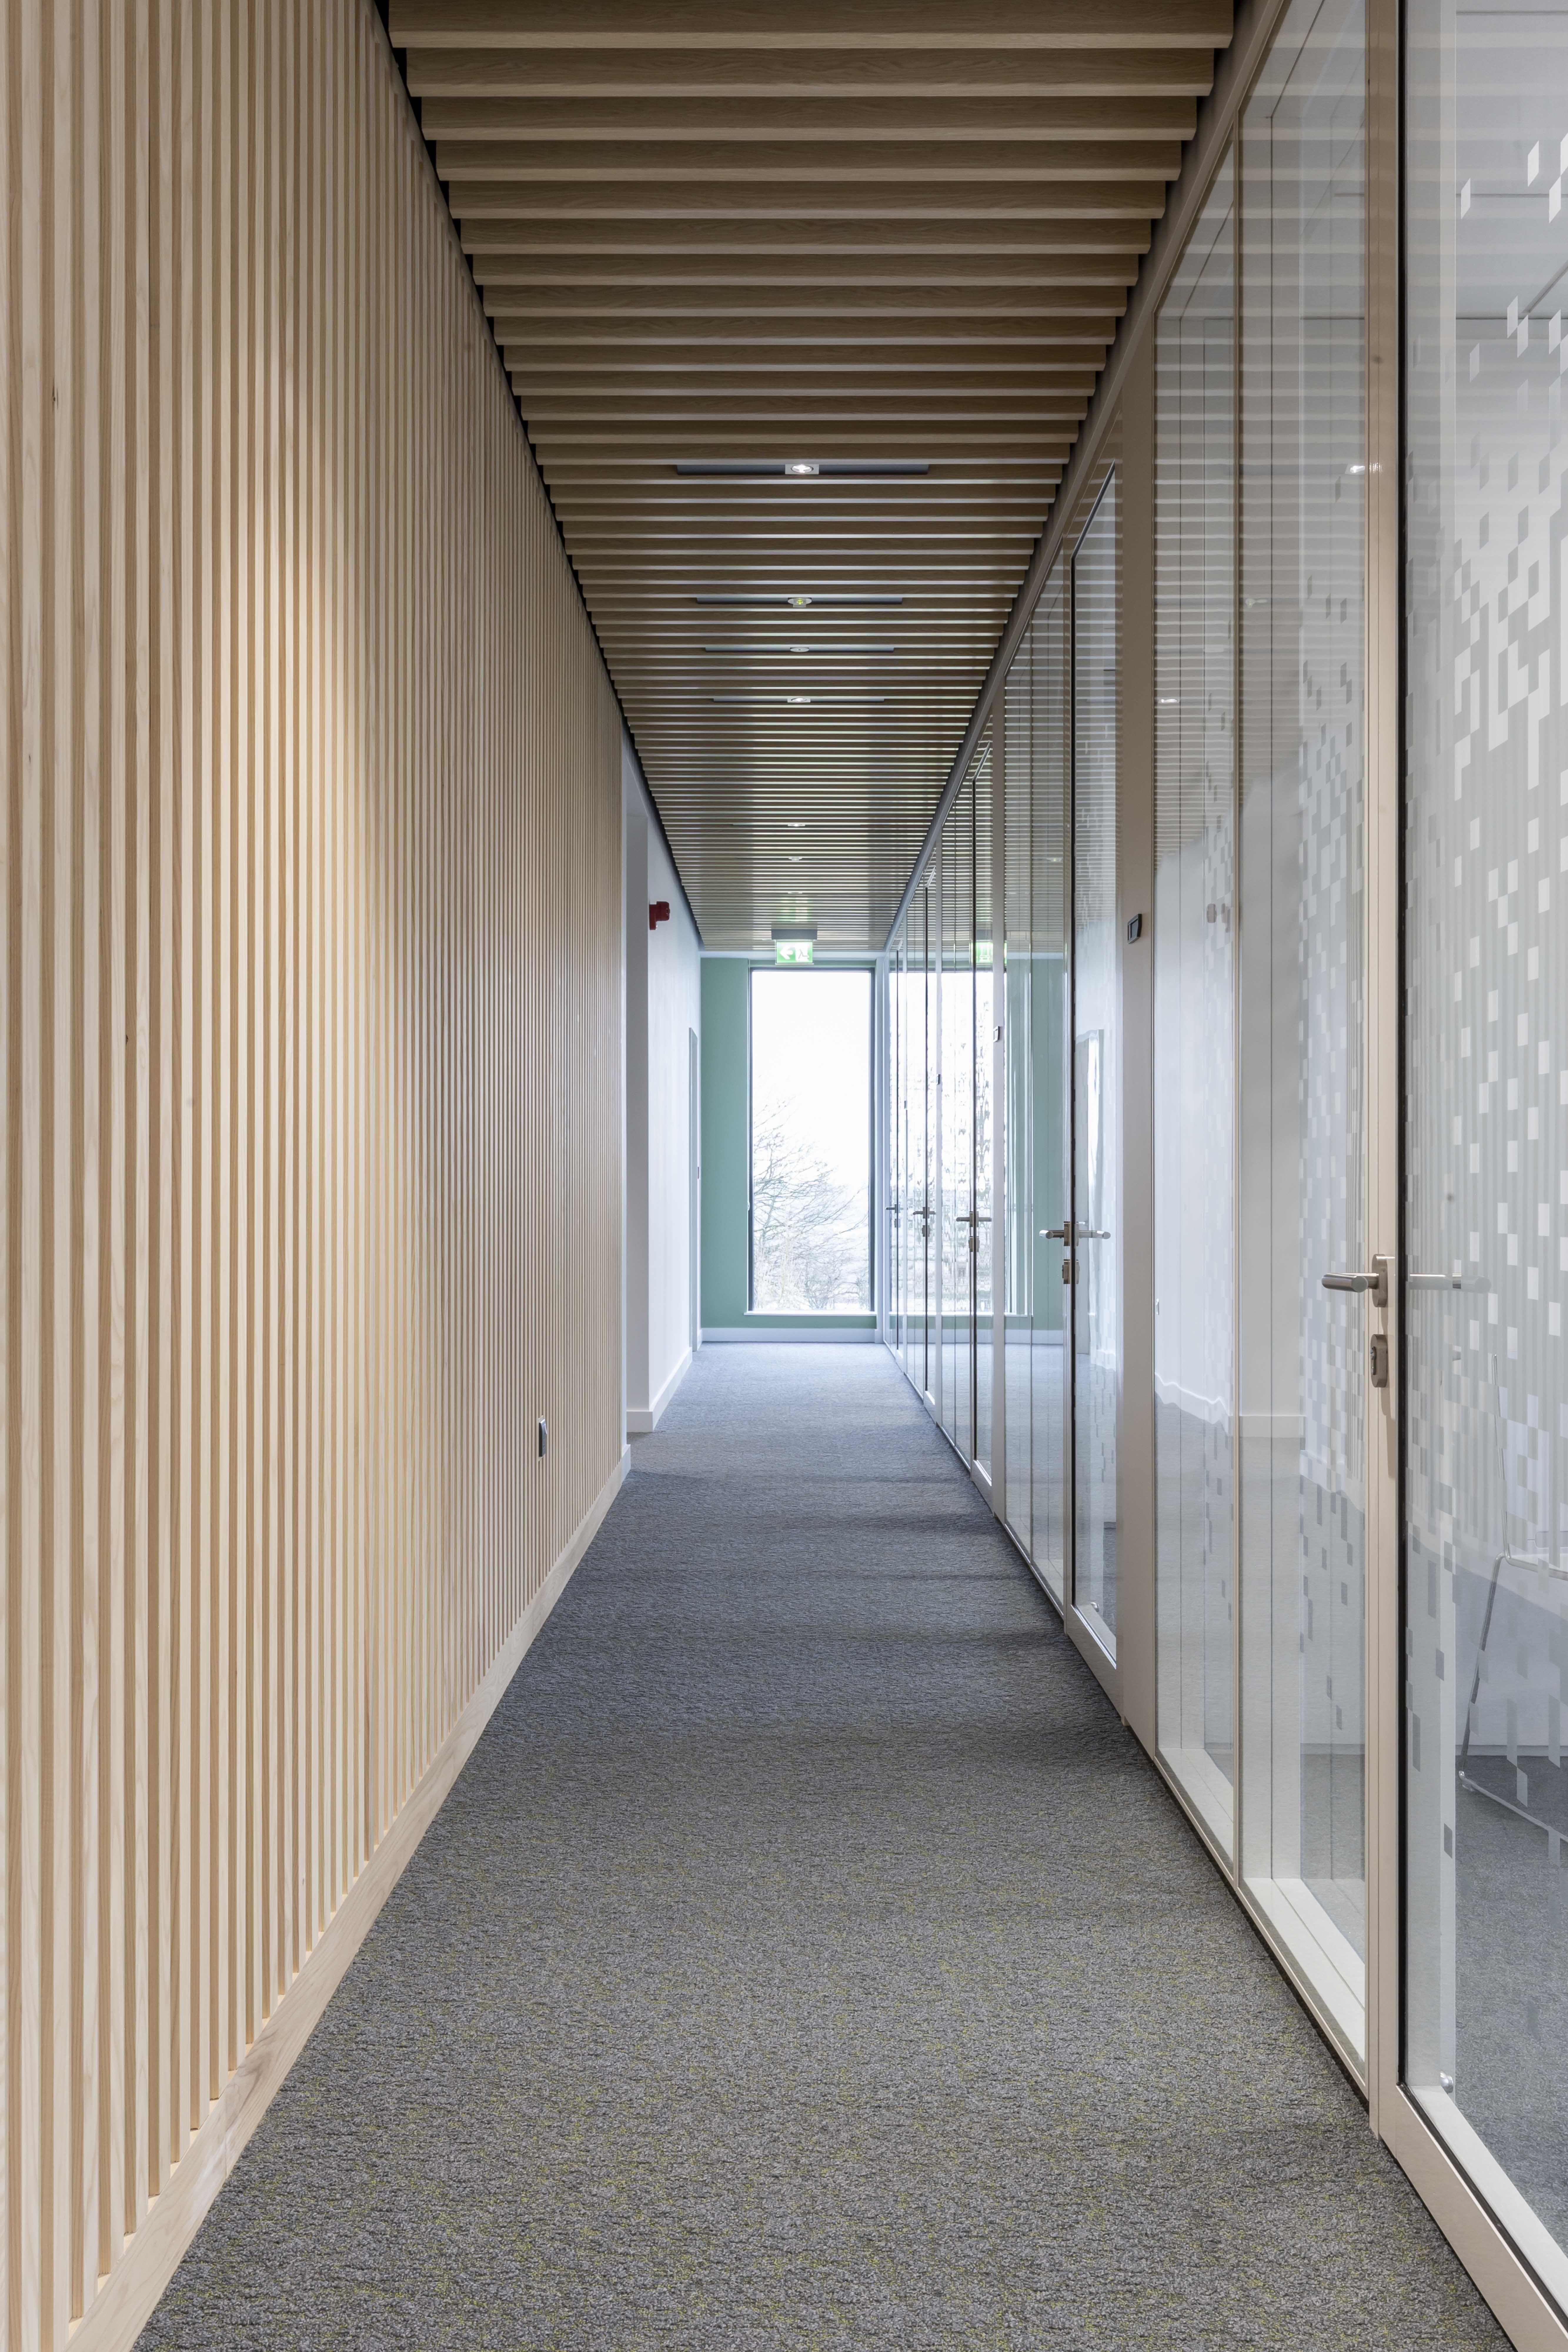 #hallway #officedesign #office #interiorarchitecture